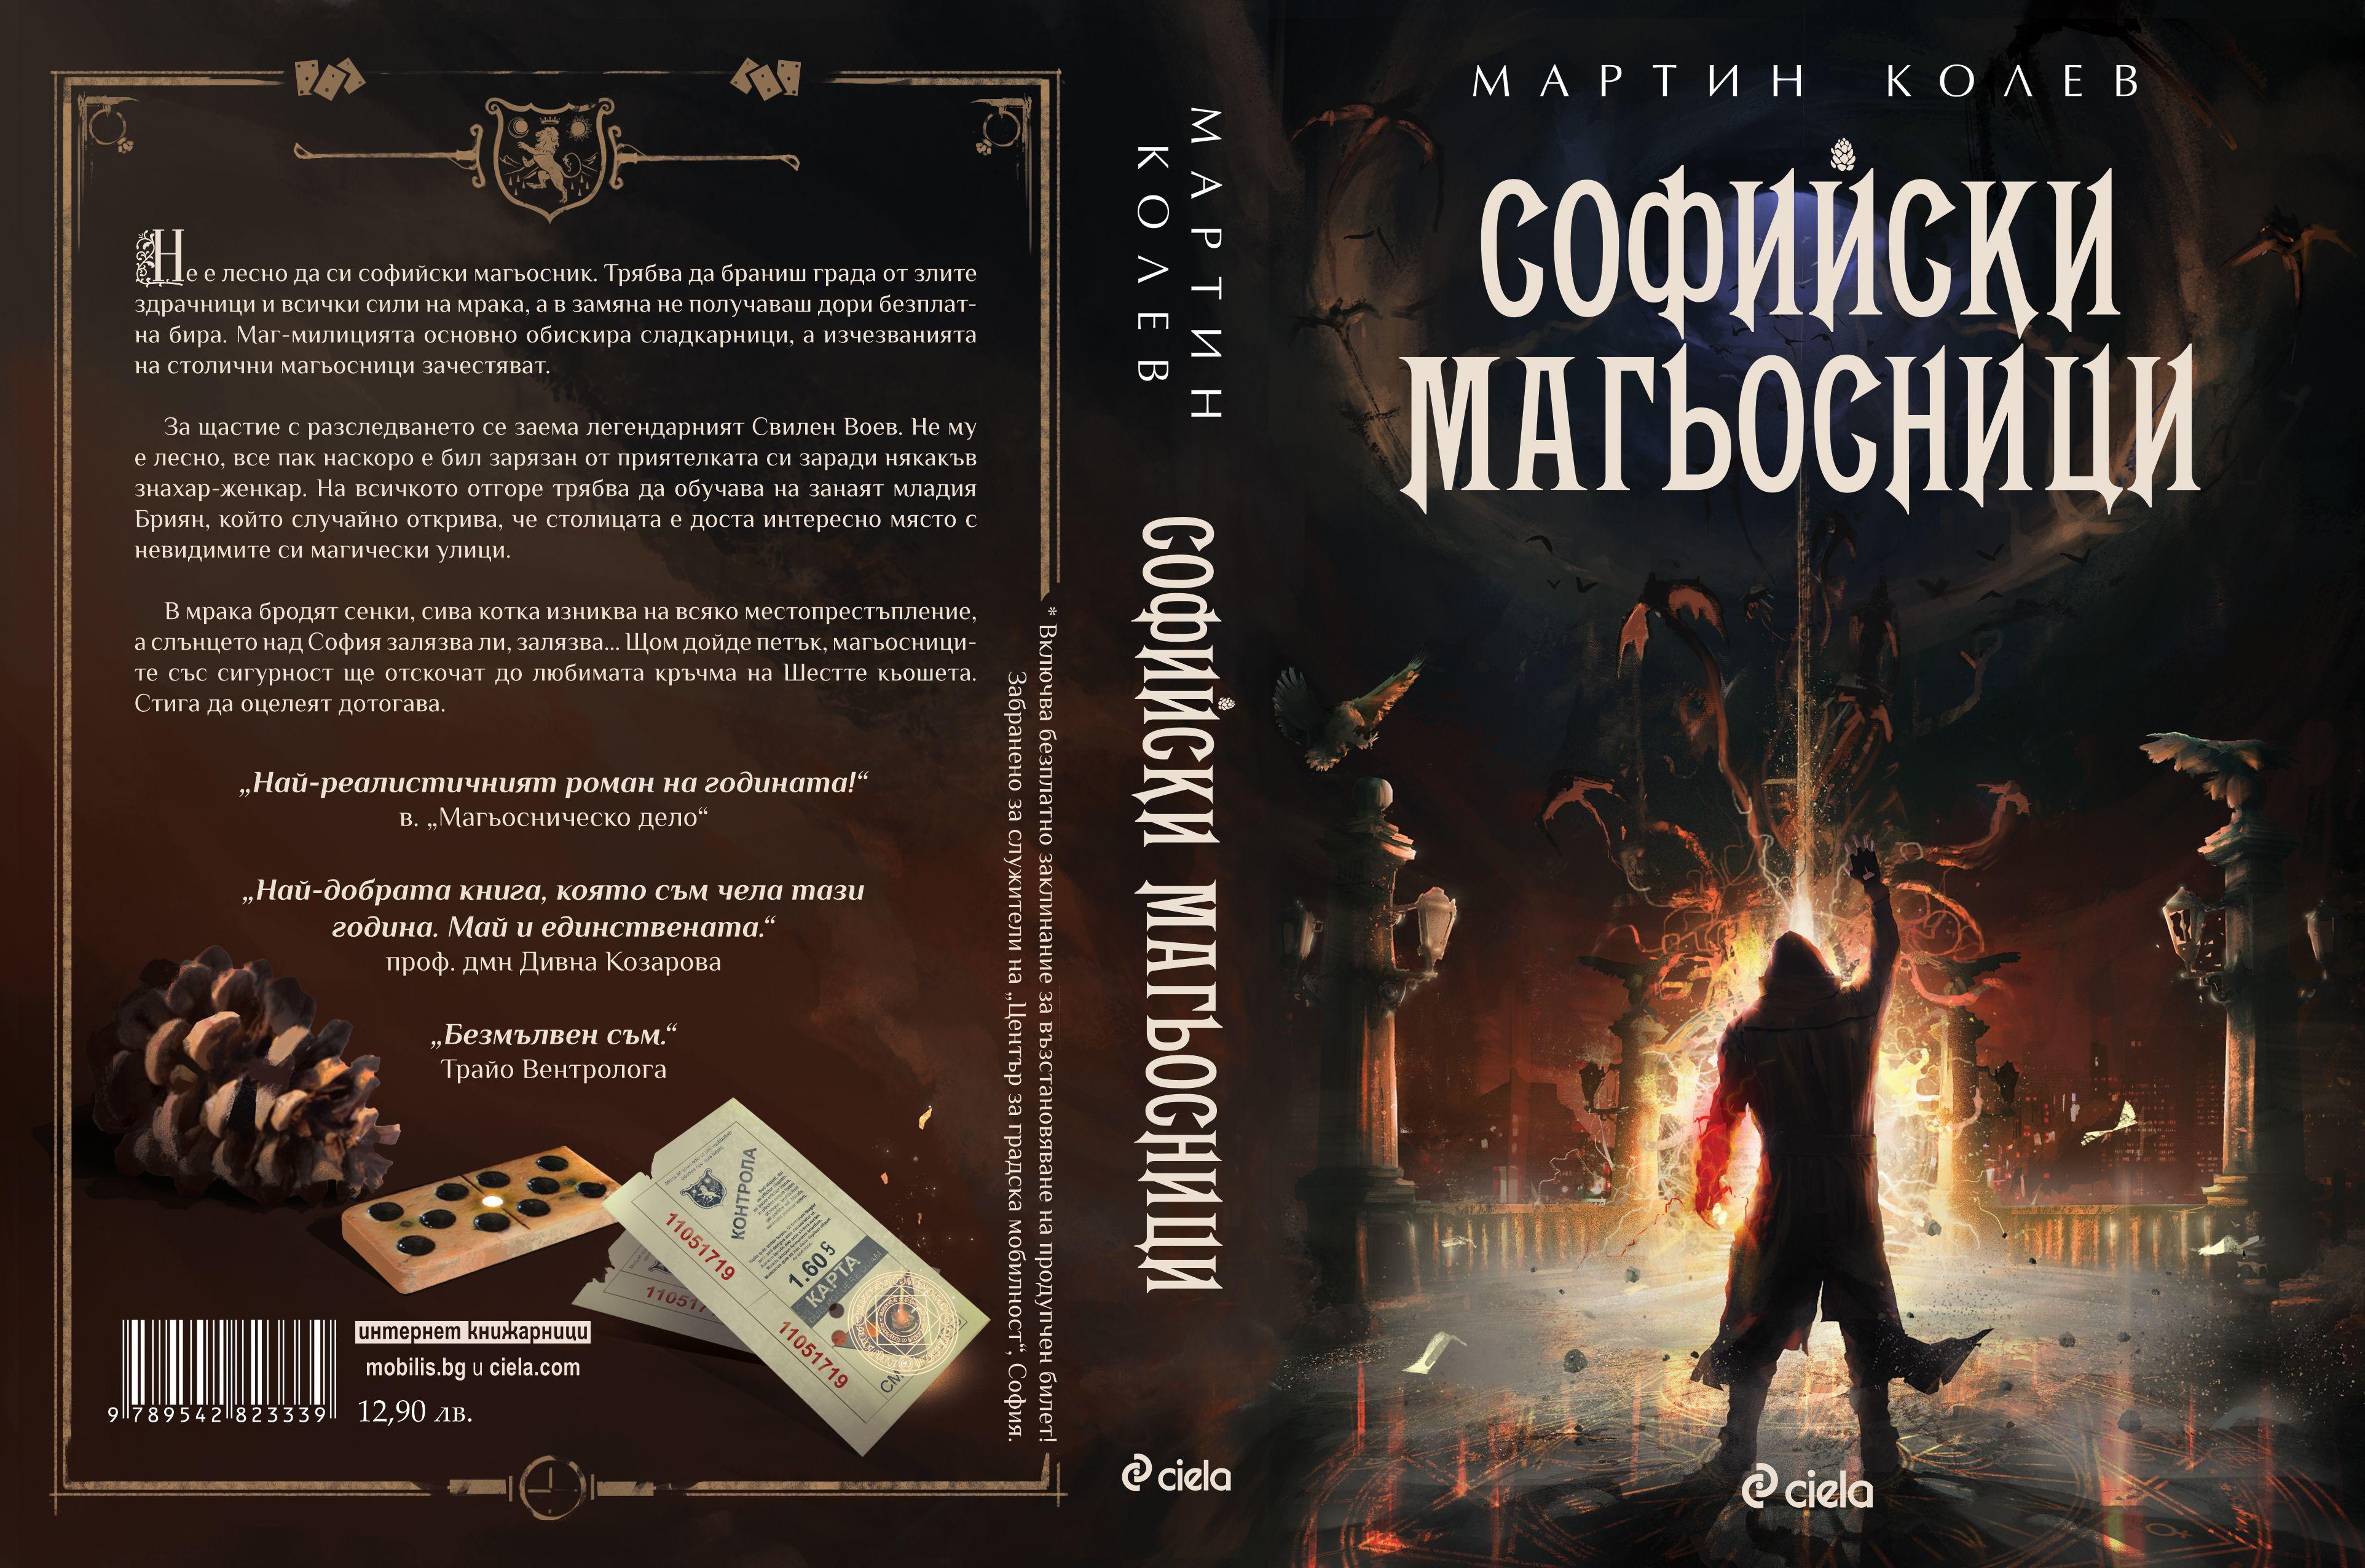 Софийски магьосници - 2